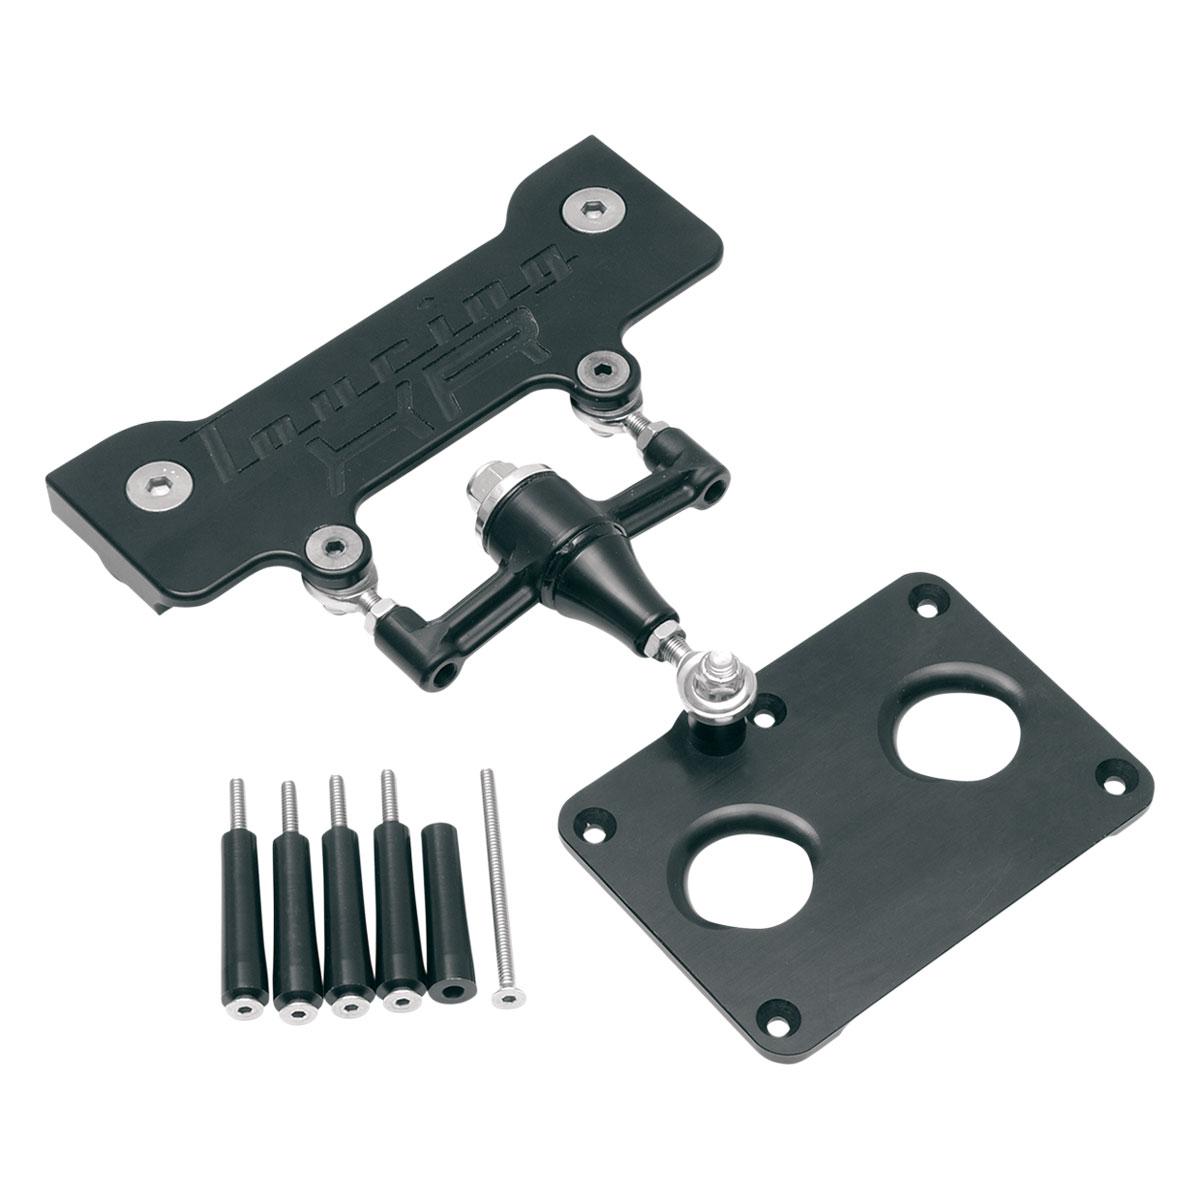 Alloy Art TXR Frame Stabilizer - TXR-1